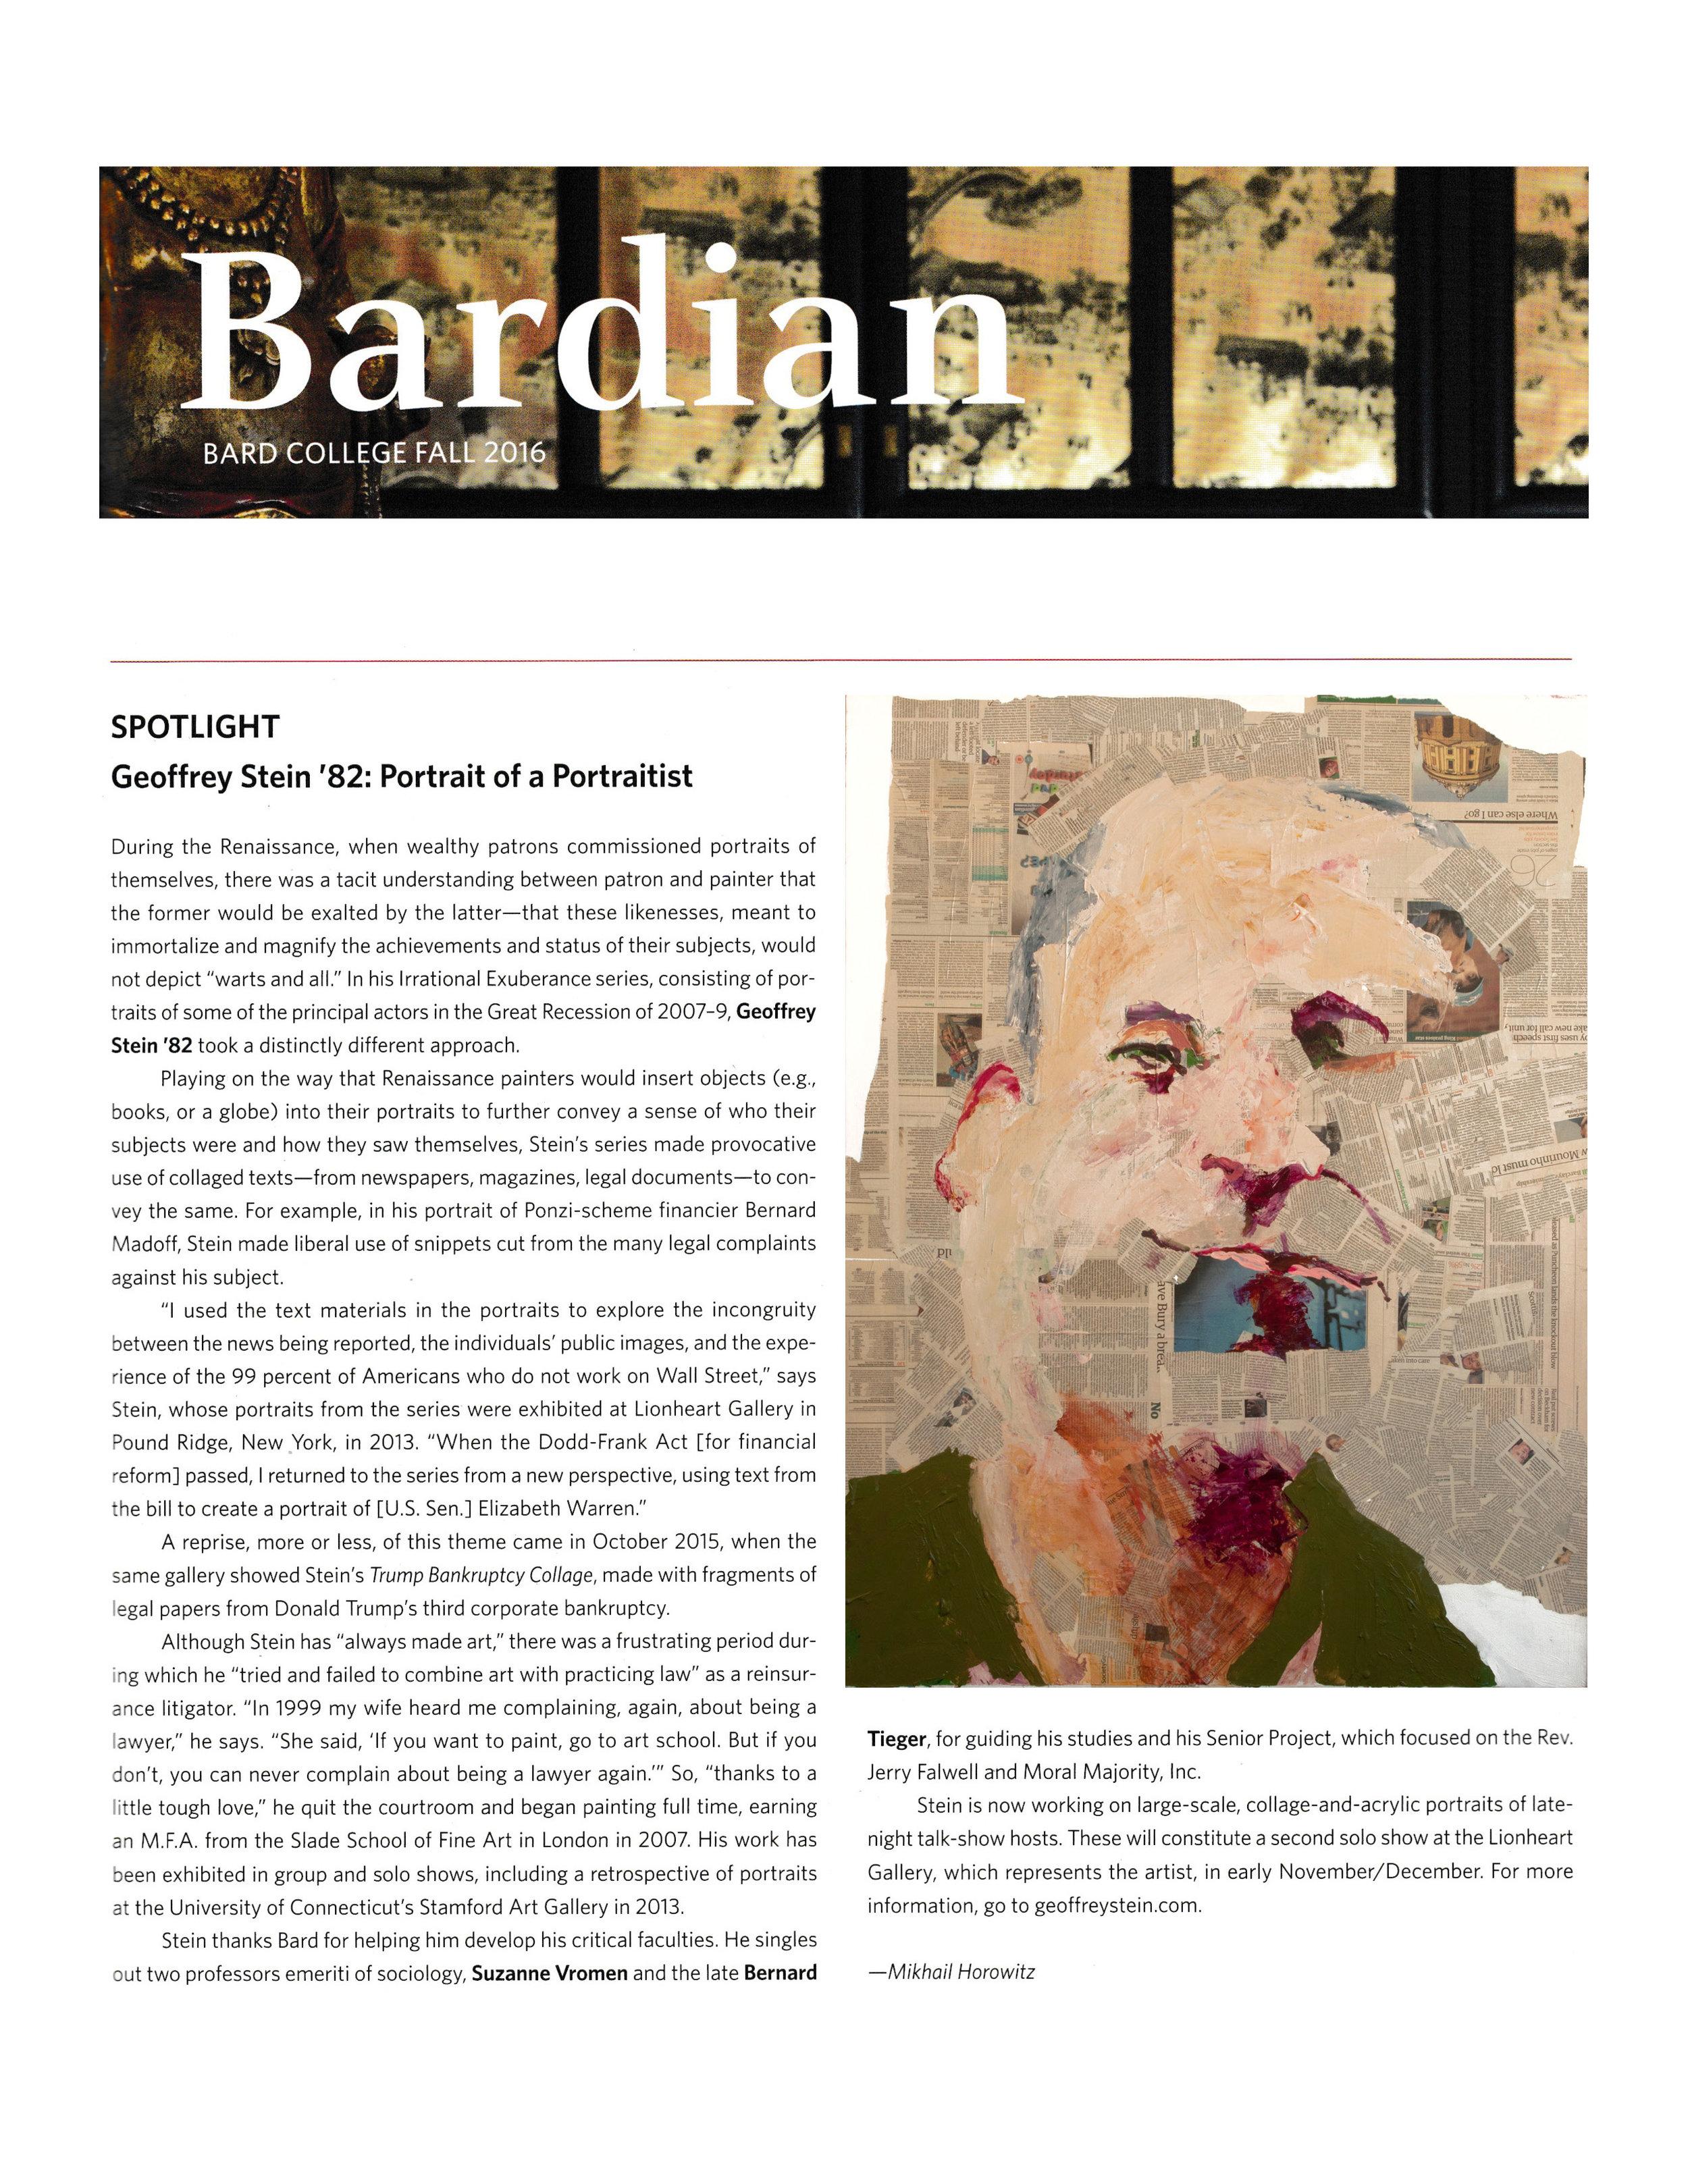 Spotlight: Geoffrey Stein '82, Portrait of a PortraitistBardian MagazineFall 2016 -